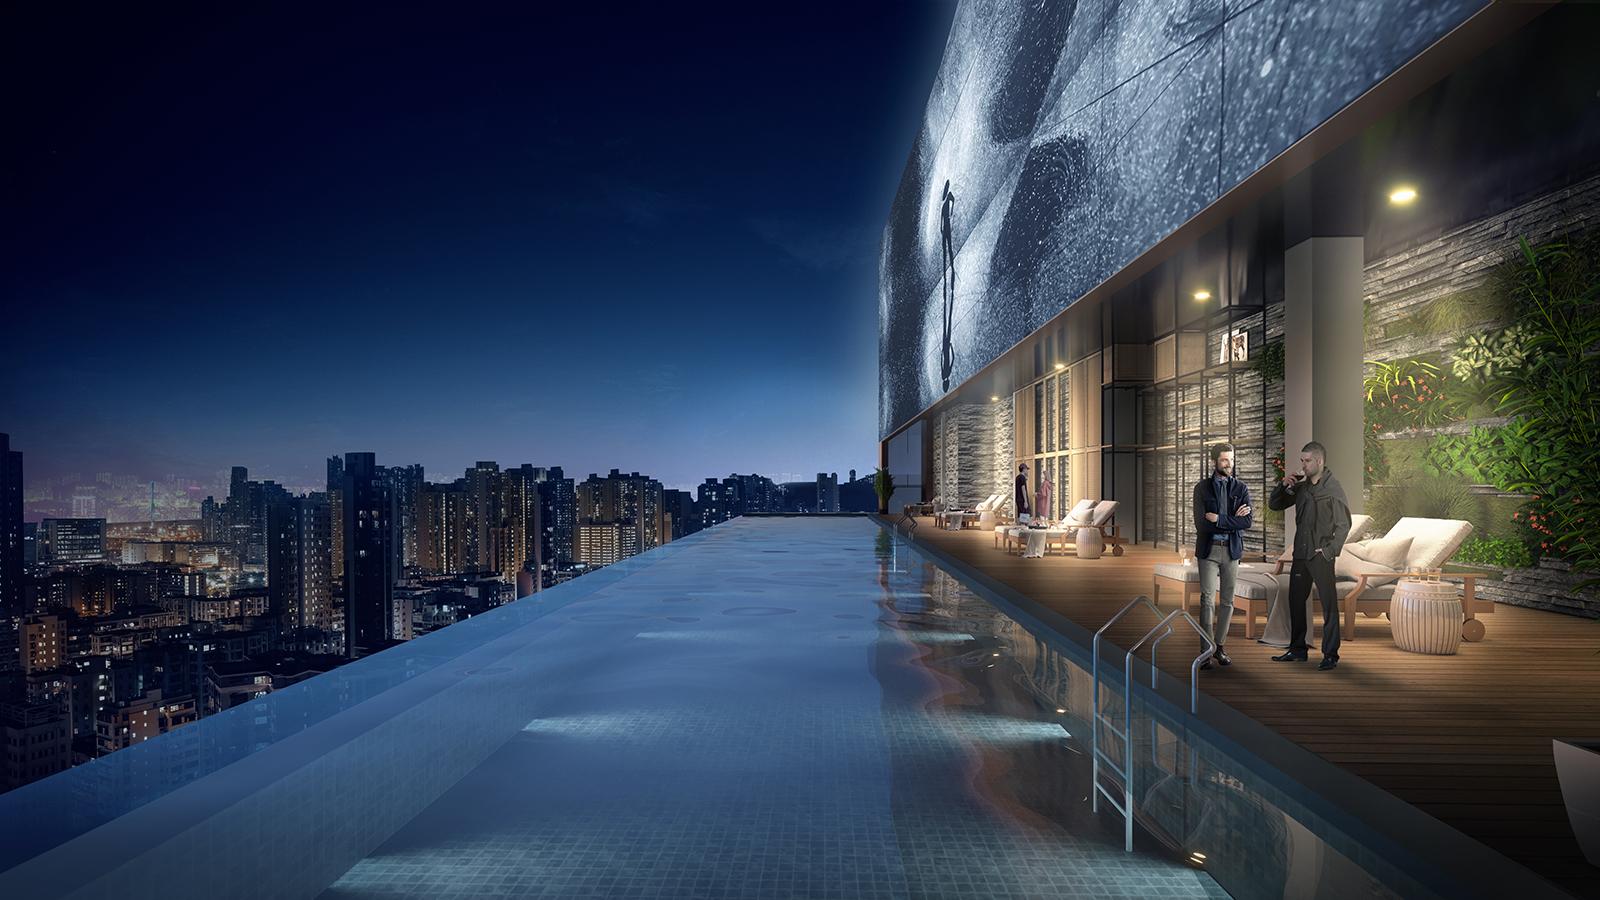 CTS (HK) HOTEL DEVELOPMENT